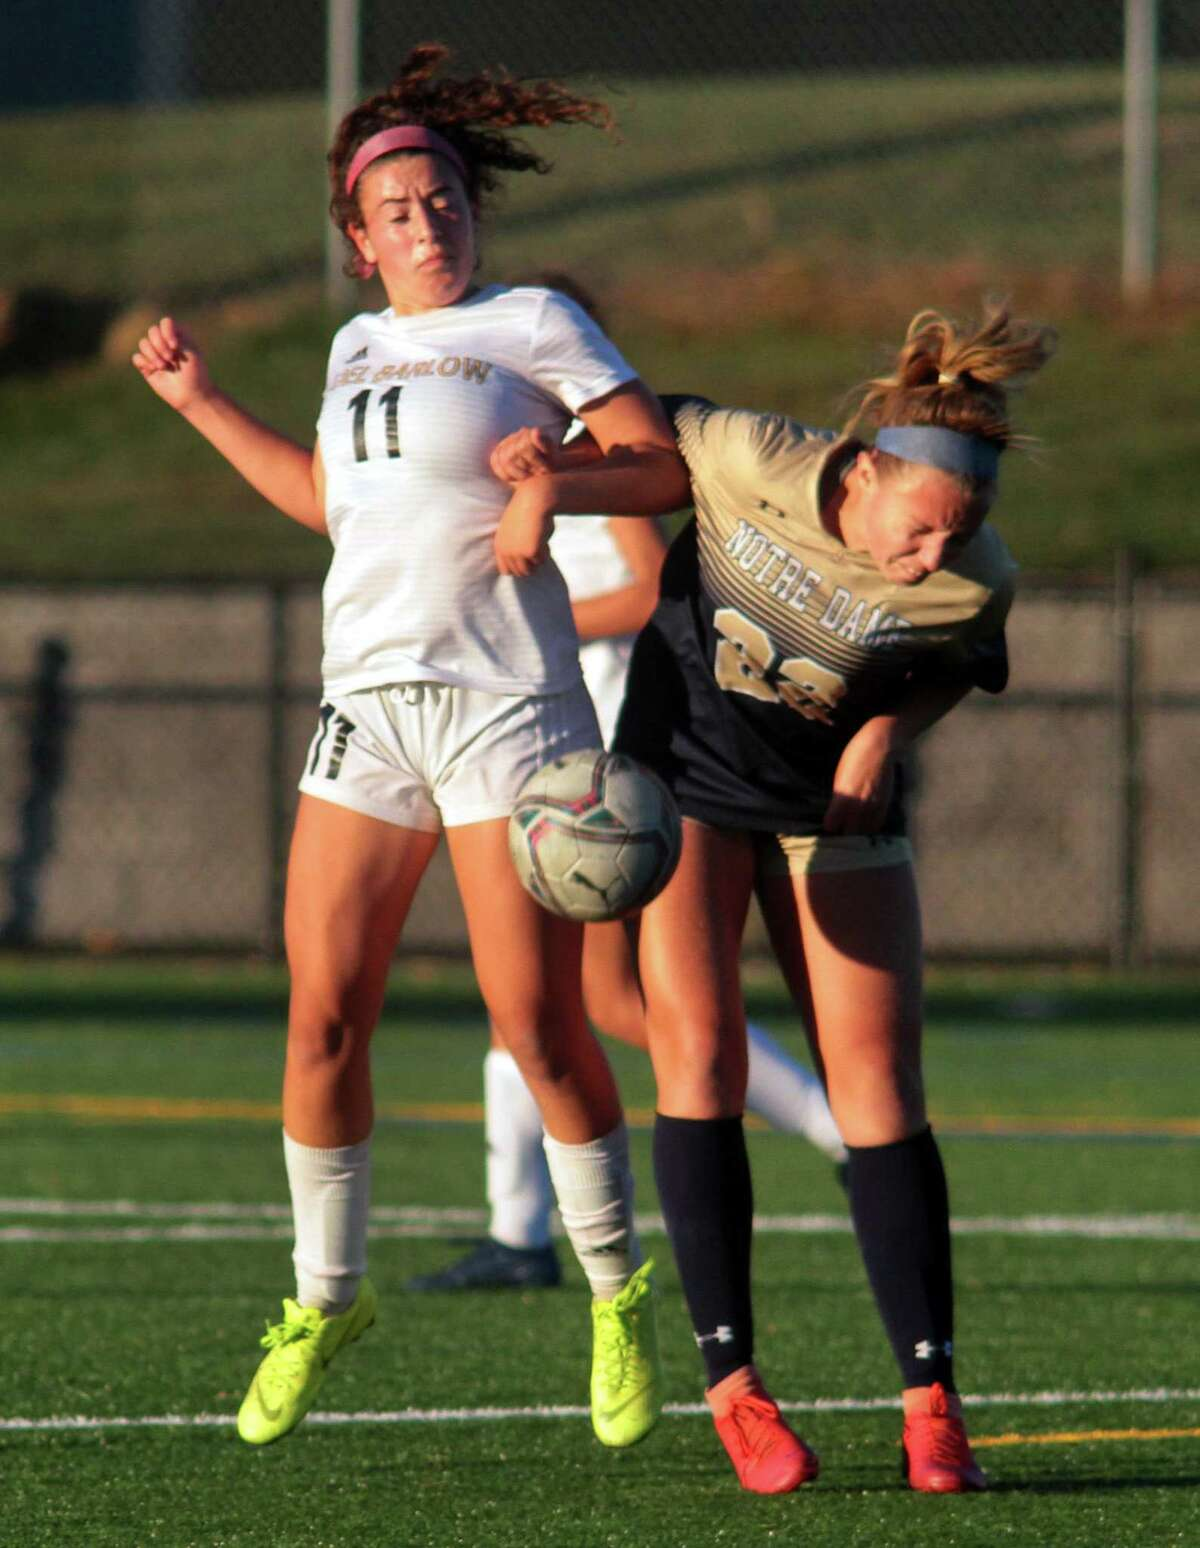 Joel Barlow's Rachel Horowitz (11), left, and Notre Dame of Fairfield's Mackenzie Ledford (22) converge on the ball during girls soccer action in Trumbull, Conn., on Thursday Oct. 8, 2020.